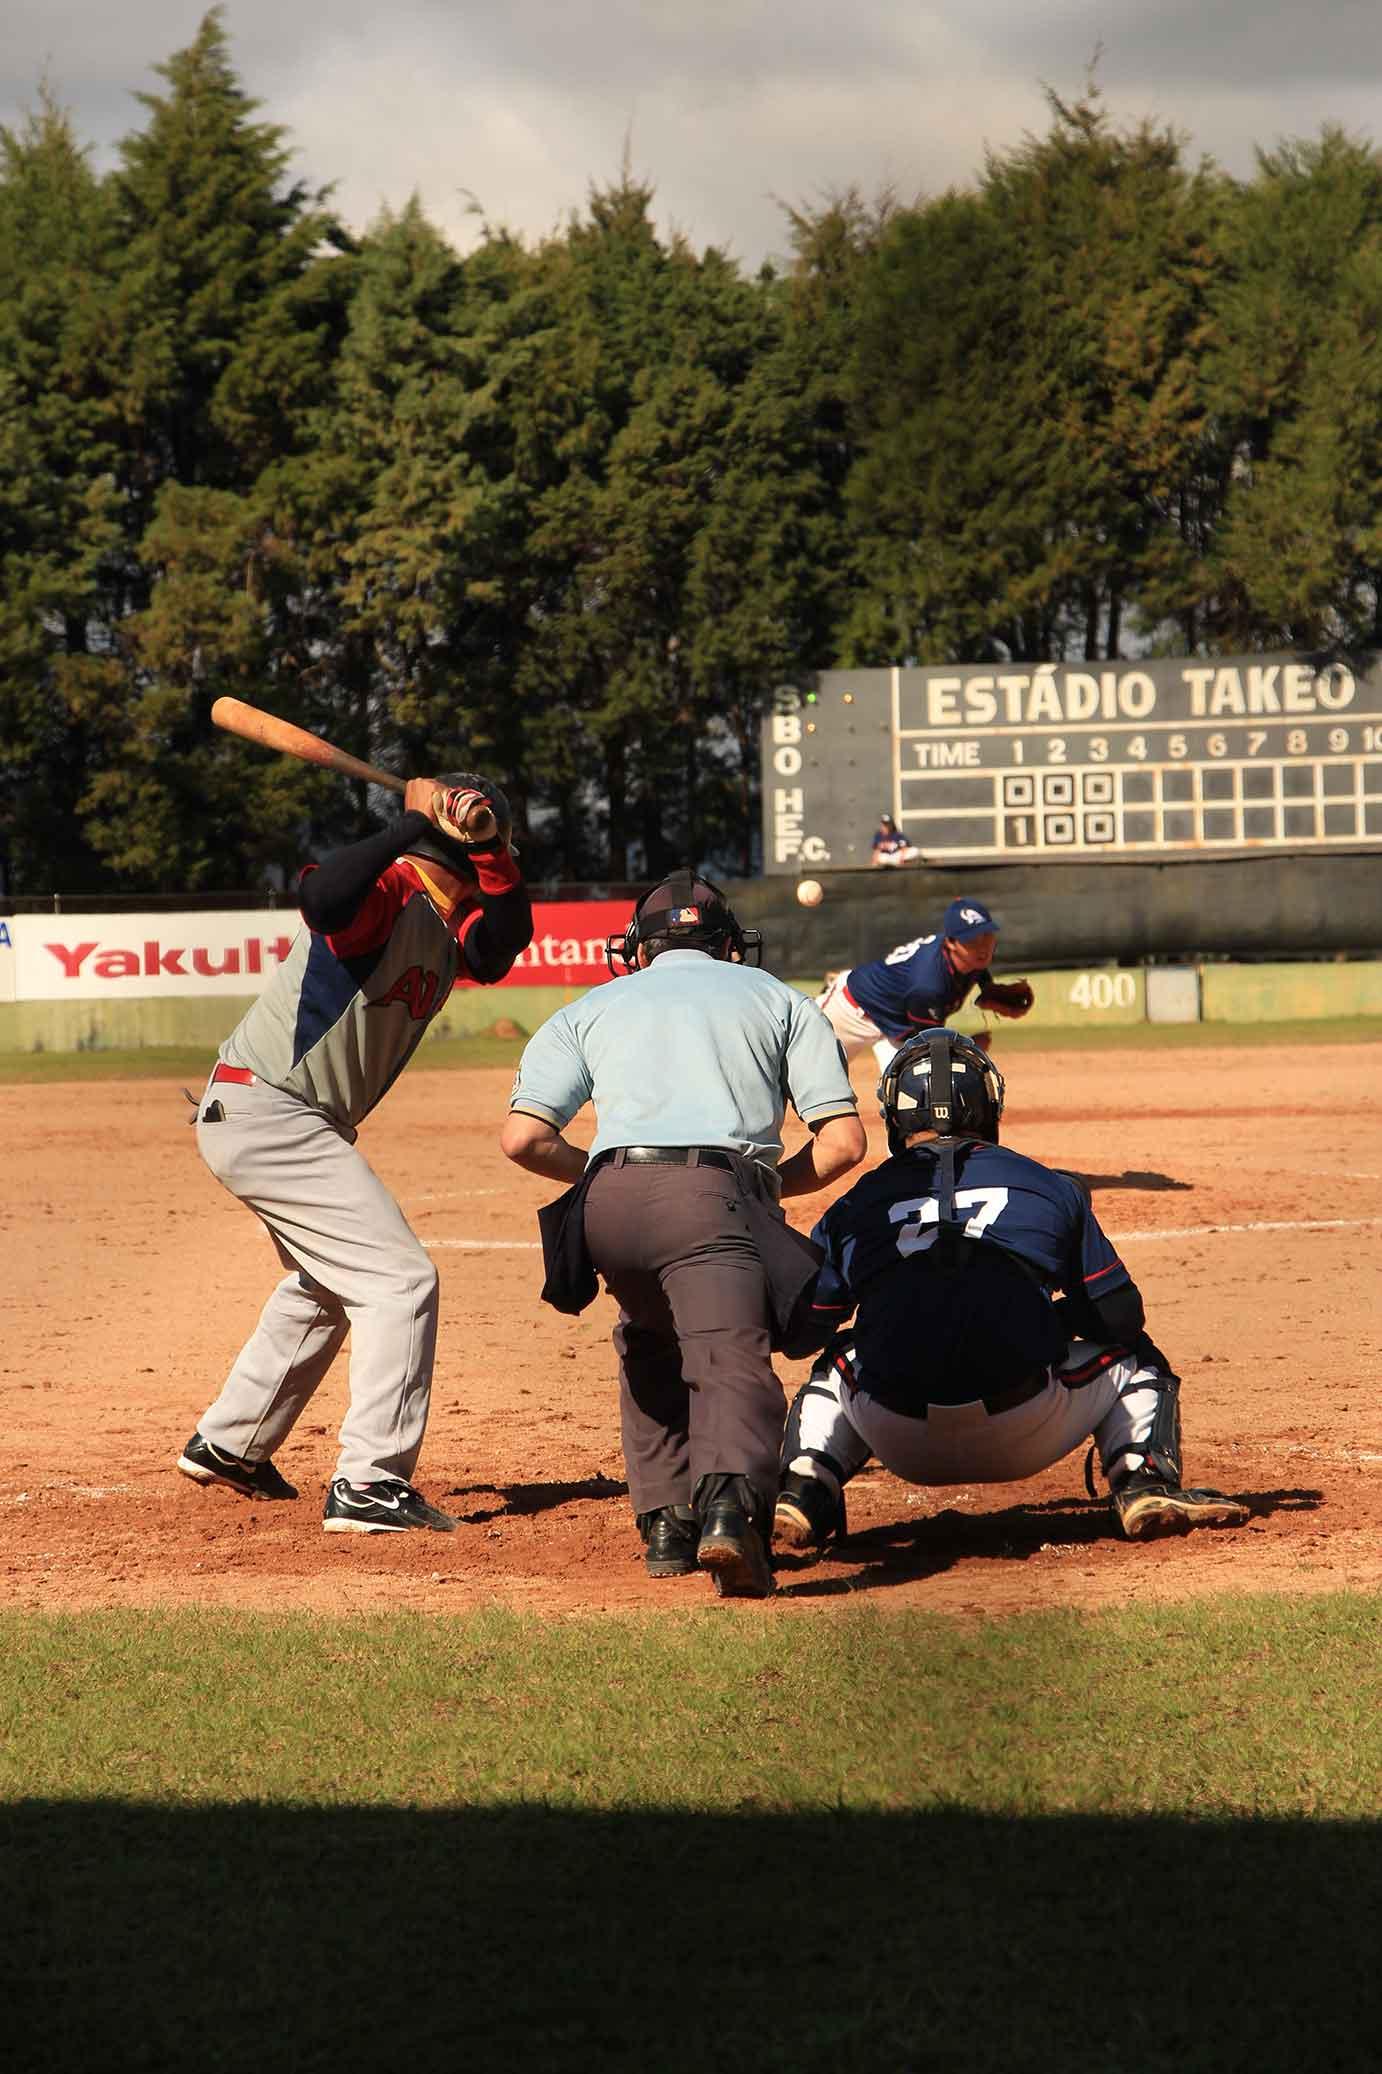 Beisebol - Cultura Japonesa